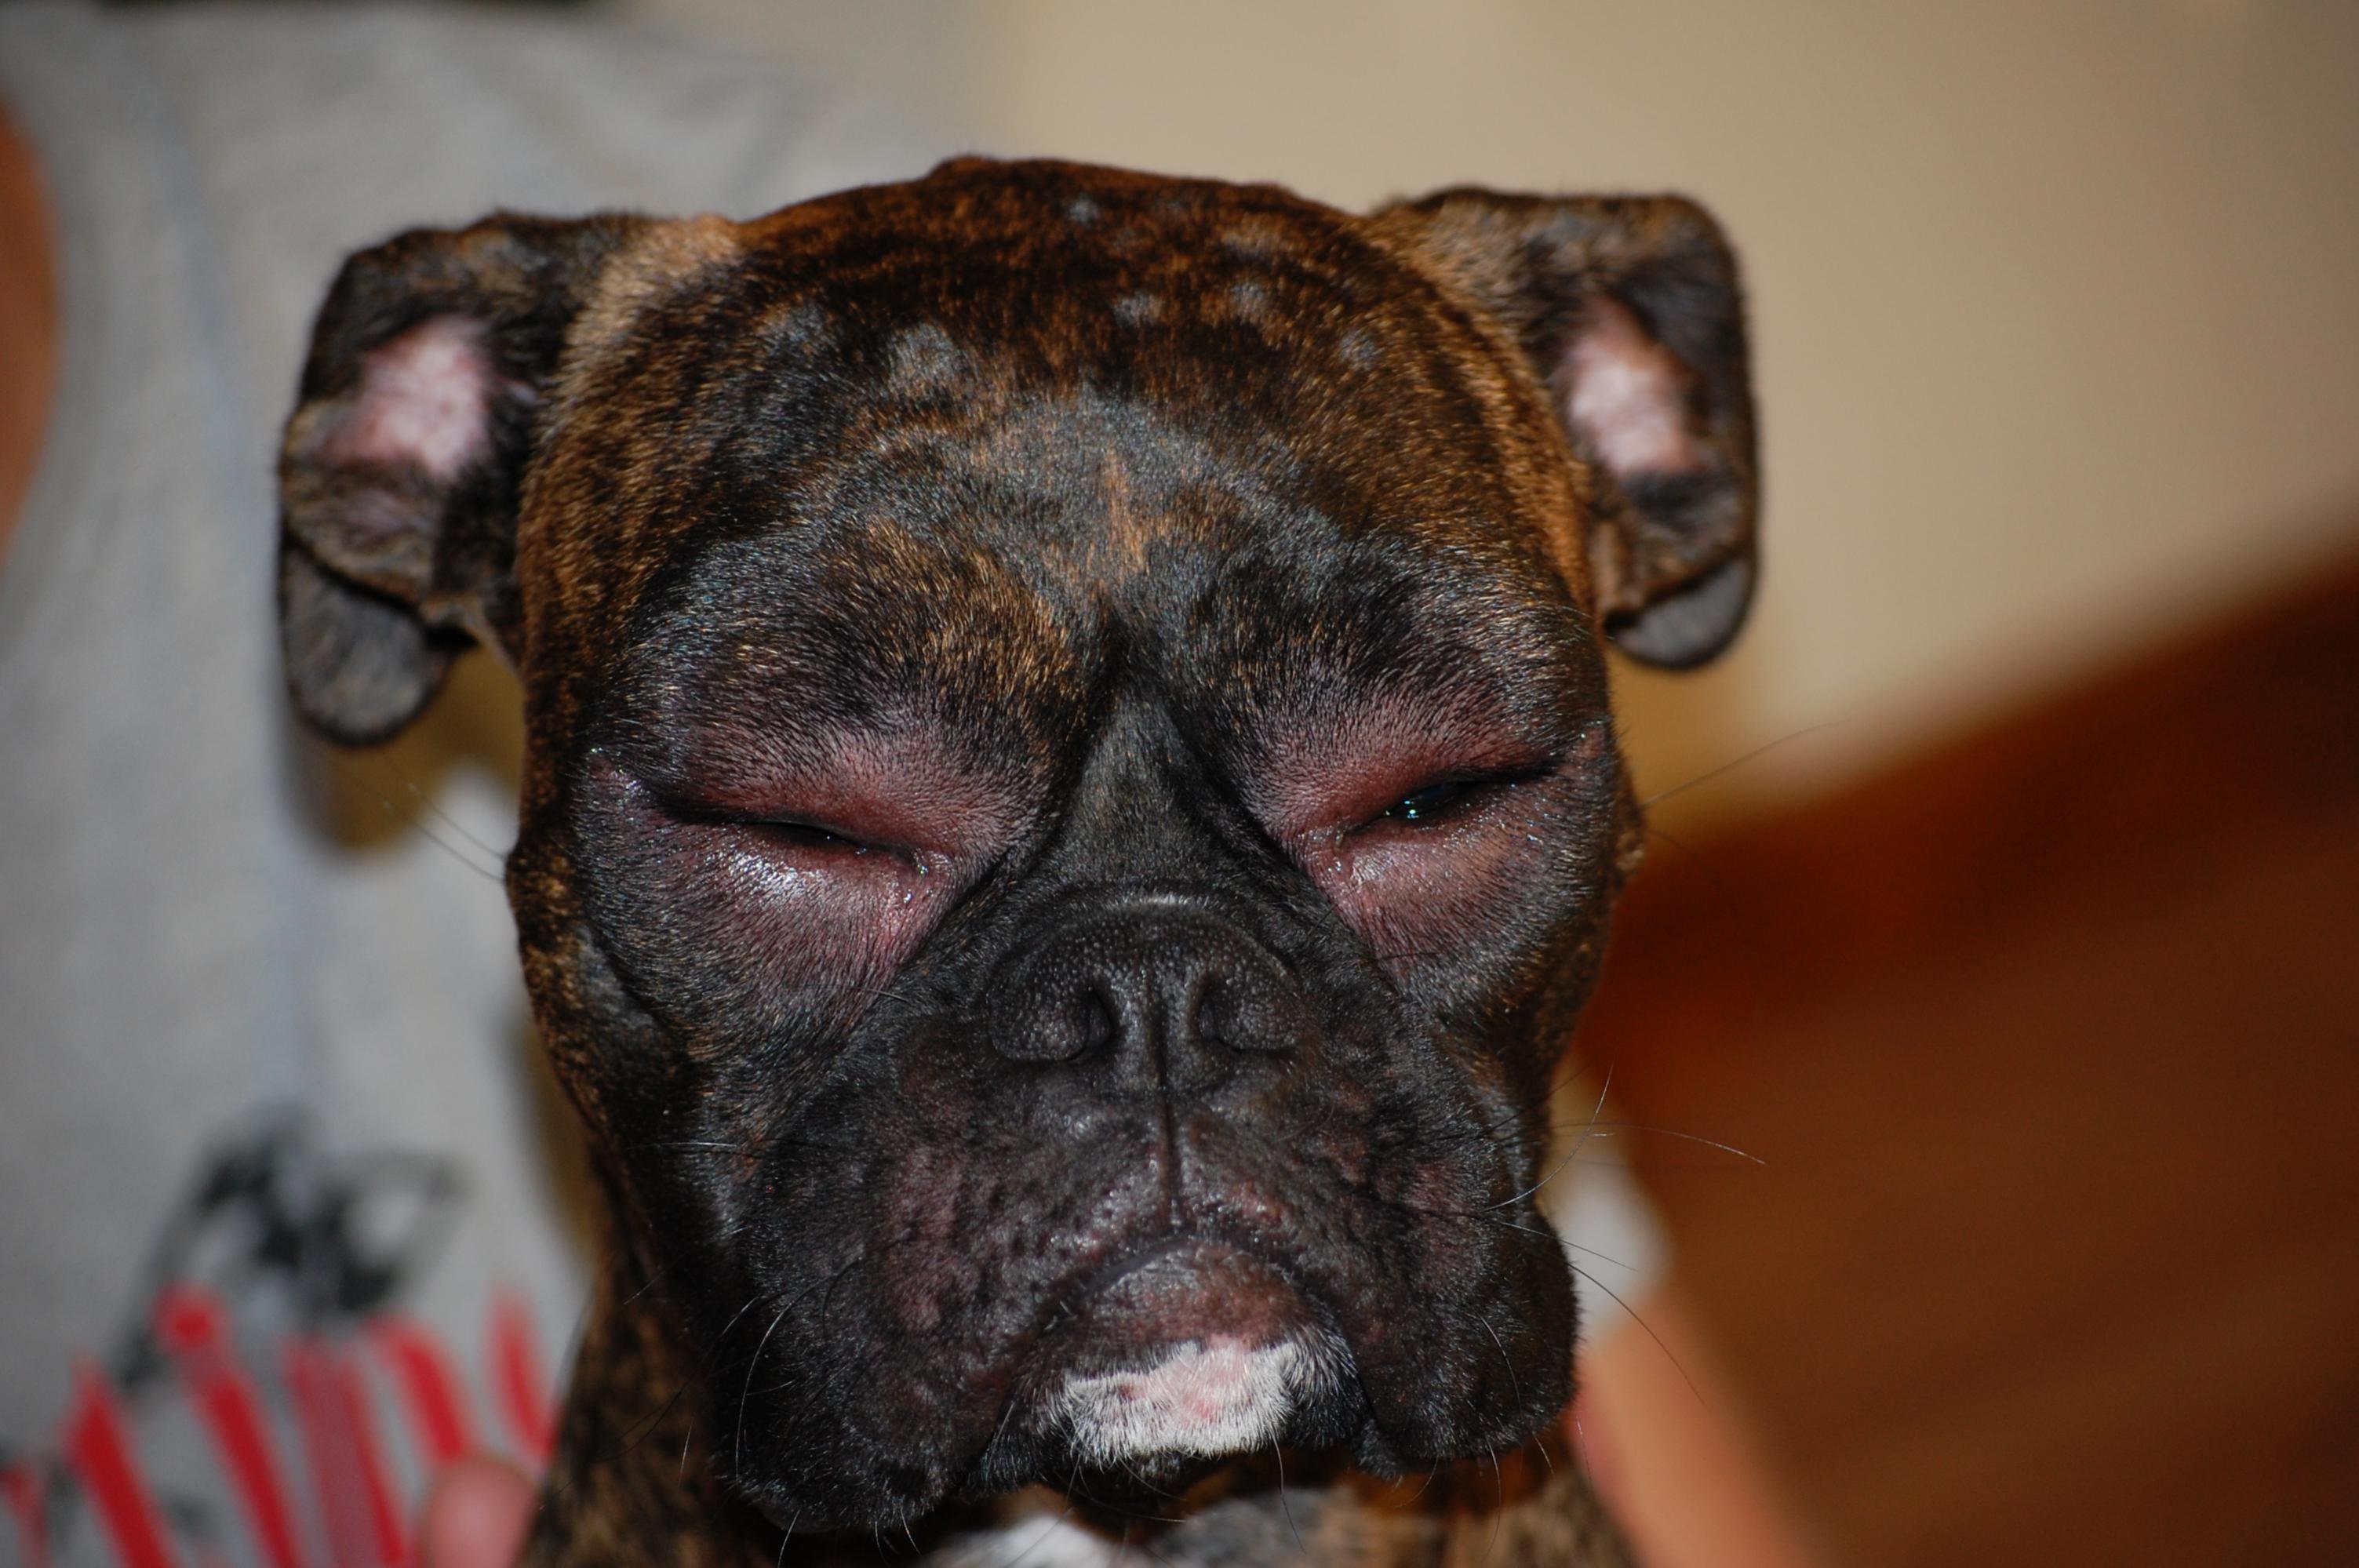 Allergic Reaction Swollen Eyes Hives Dsc 0108 Jpg